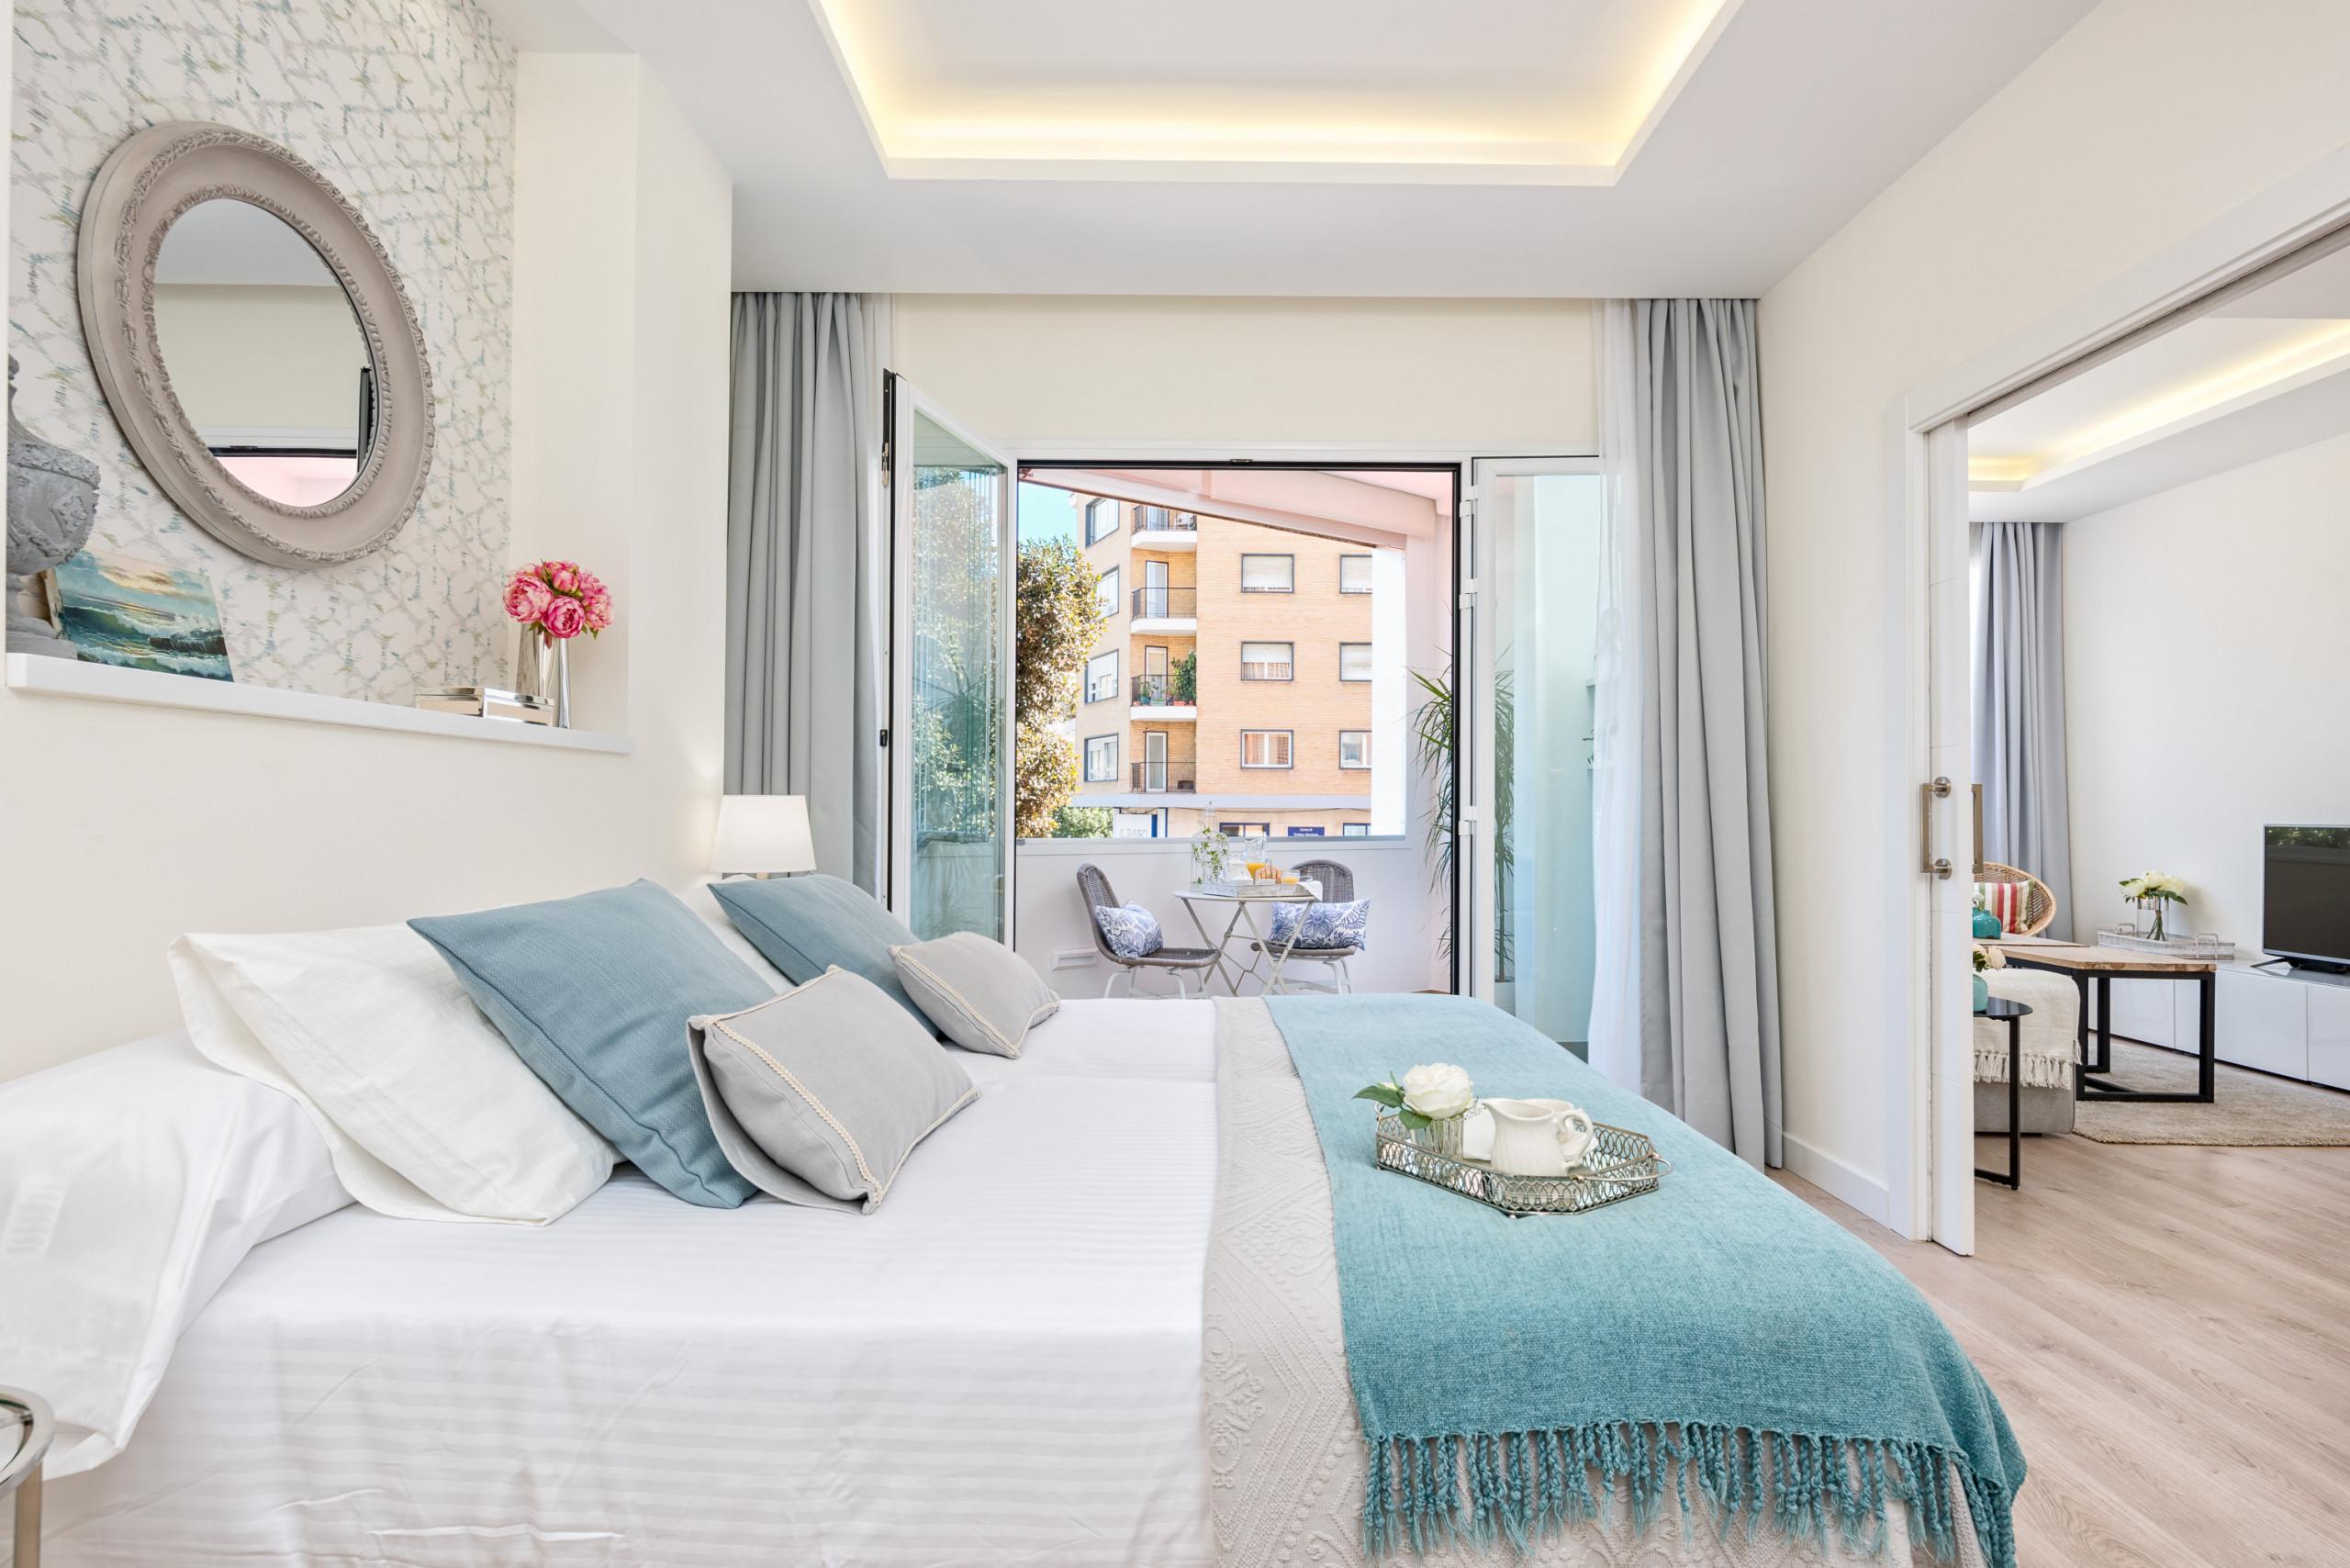 Centro-Alameda - Apartments in Málaga